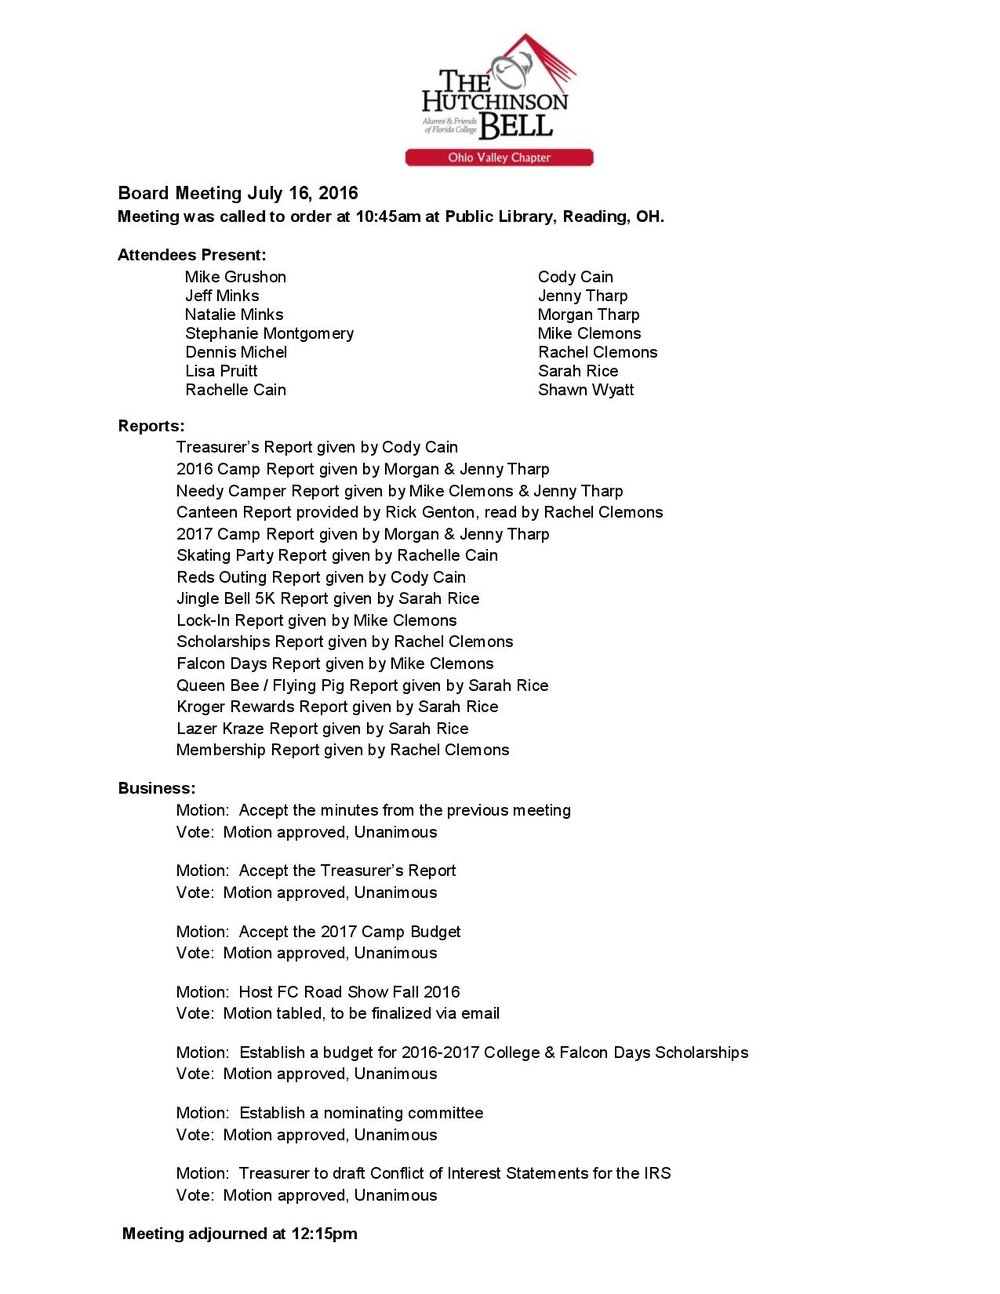 MinutesGeneralAssemblyMeetingJuly162016-page-001.jpg